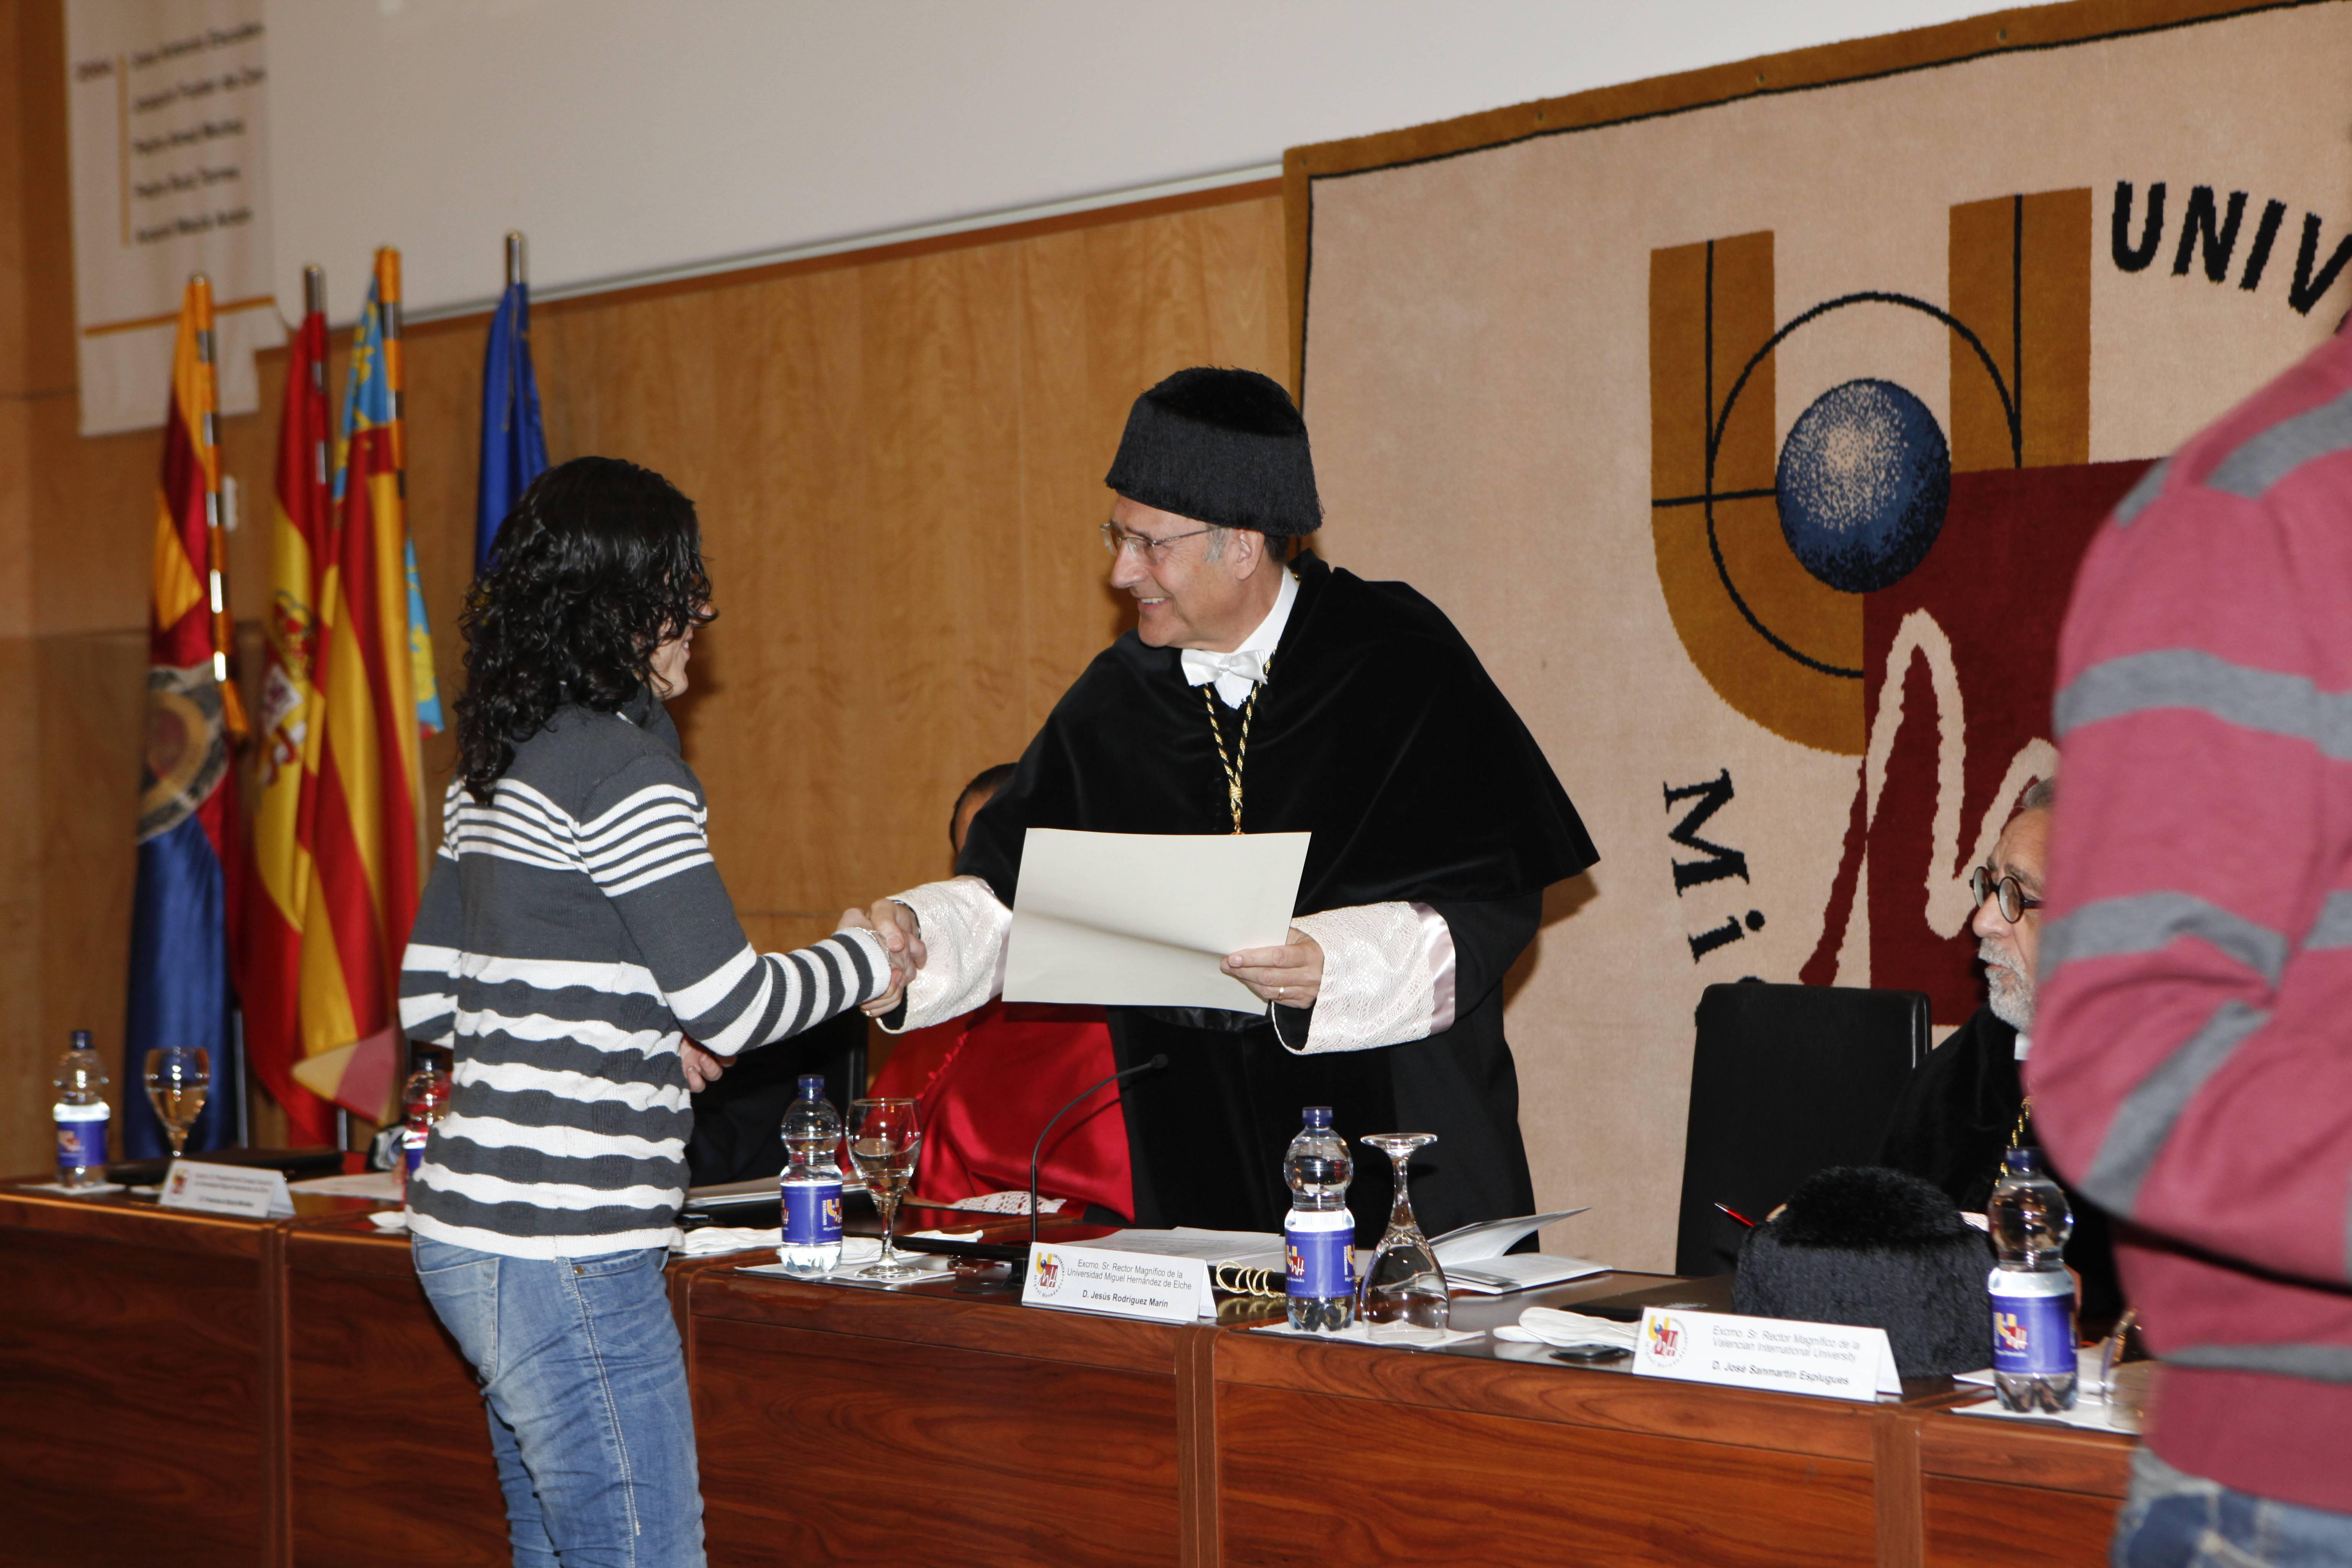 doctor-honoris-causa-luis-gamir_mg_0960.jpg